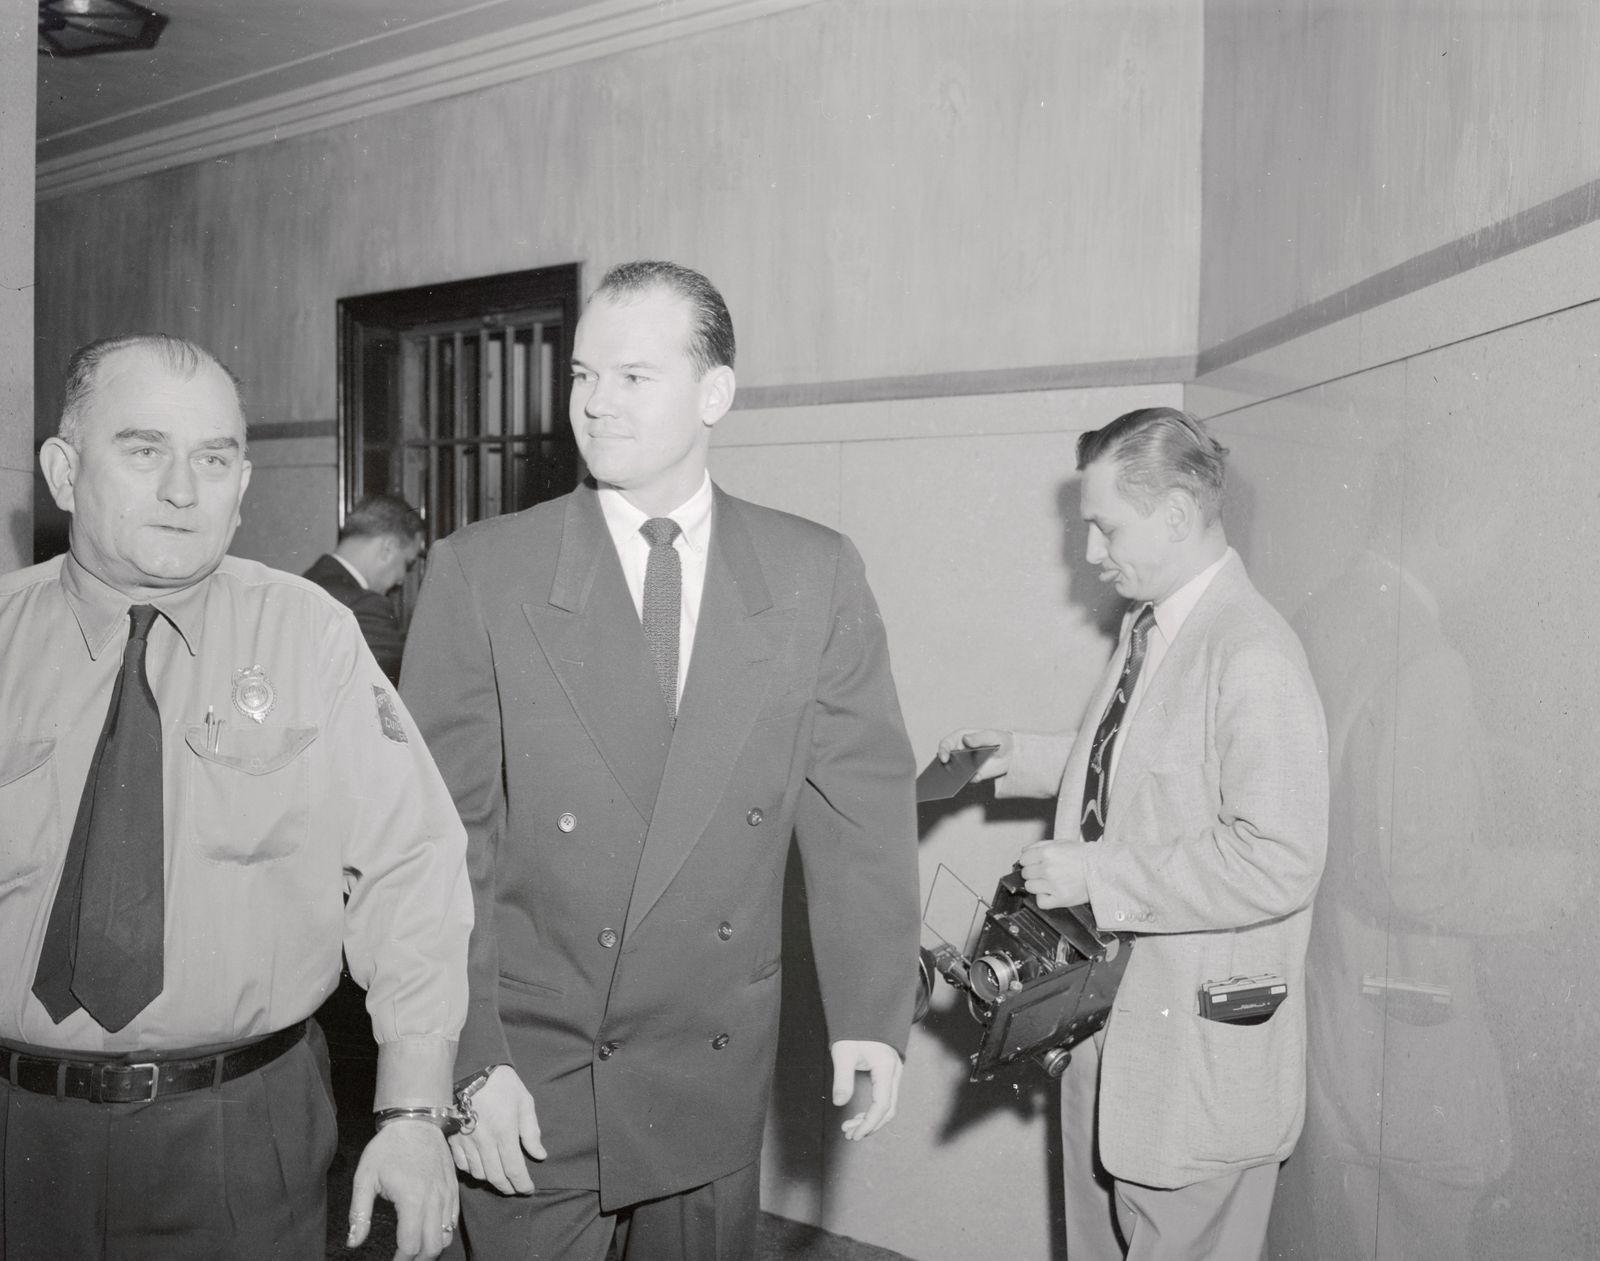 Forensik - Dr Samuel Sheppard Entering Court Handcuffed to Deputy